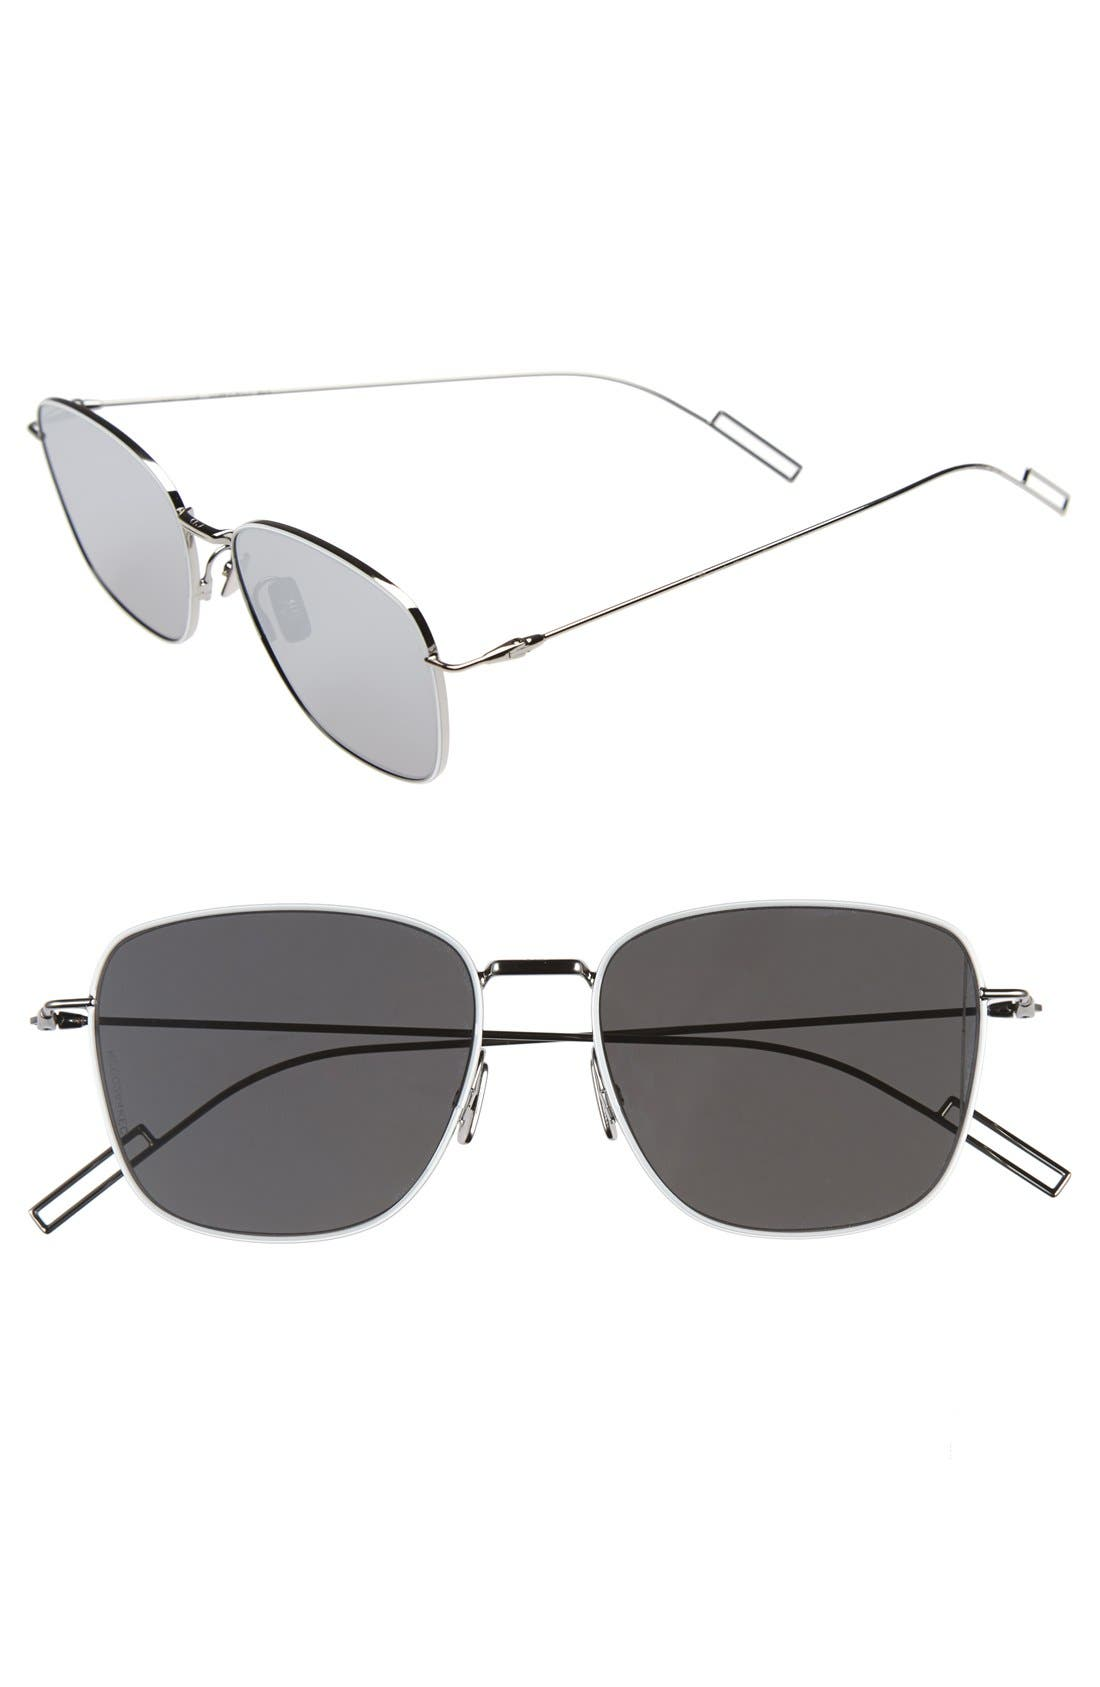 DIOR HOMME Composit 1.1S 54mm Metal Sunglasses